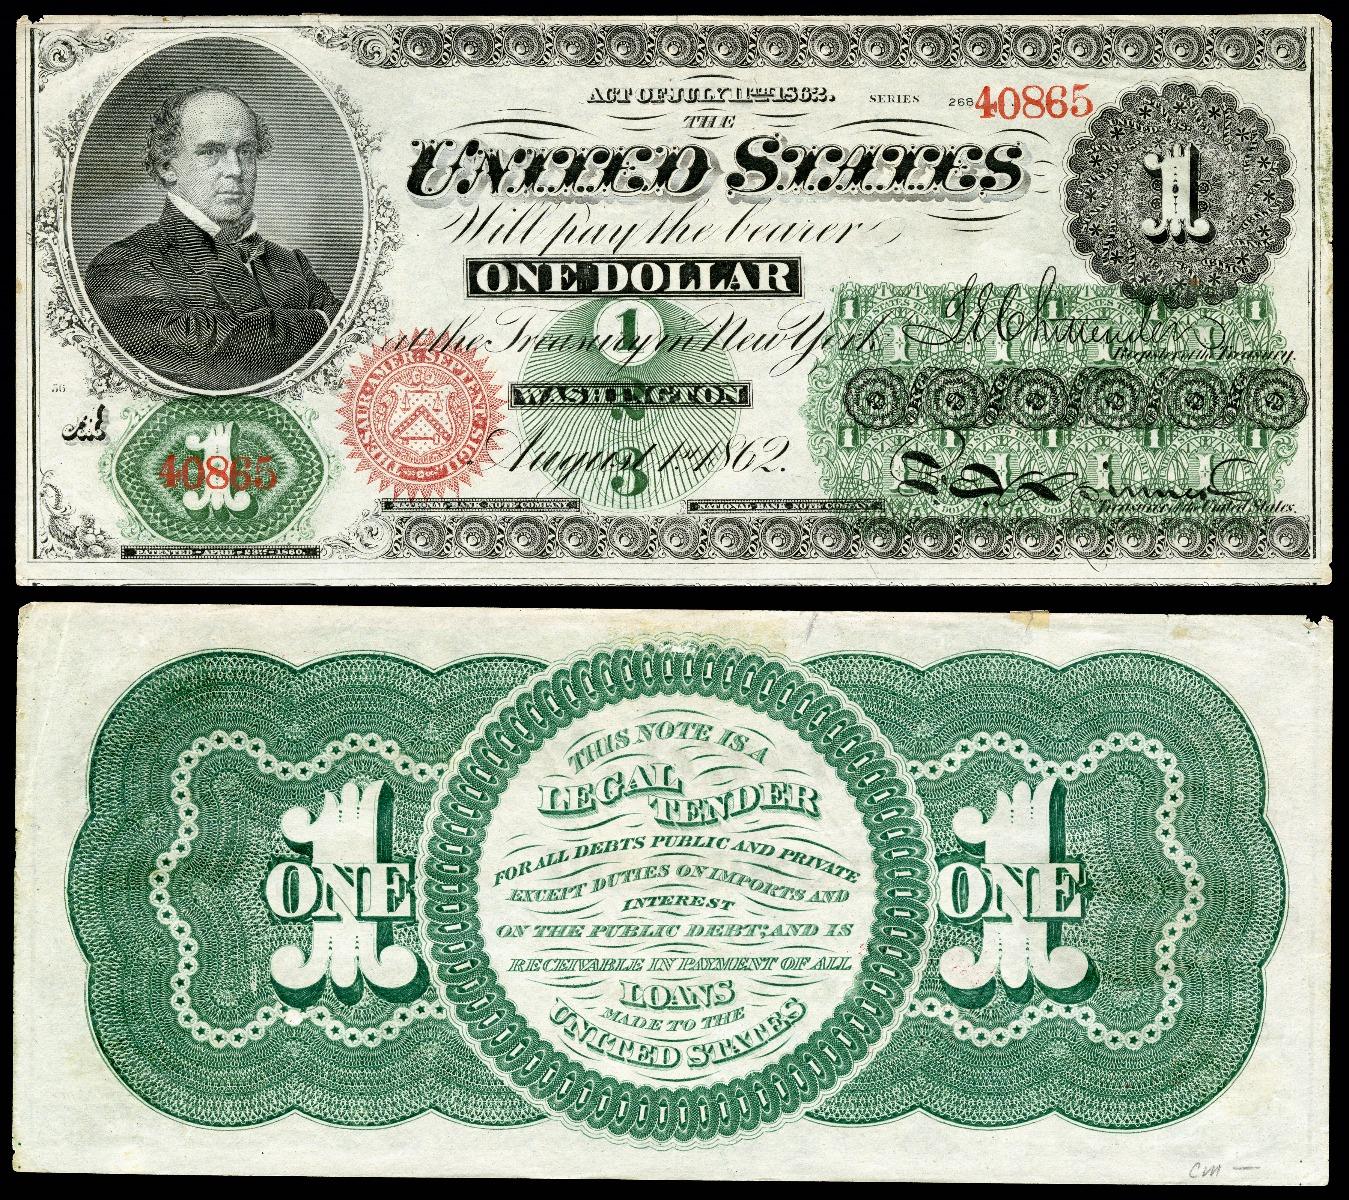 greenback vs gold dollar coin values Civil War SD Bullion SDBullion.com.jpg